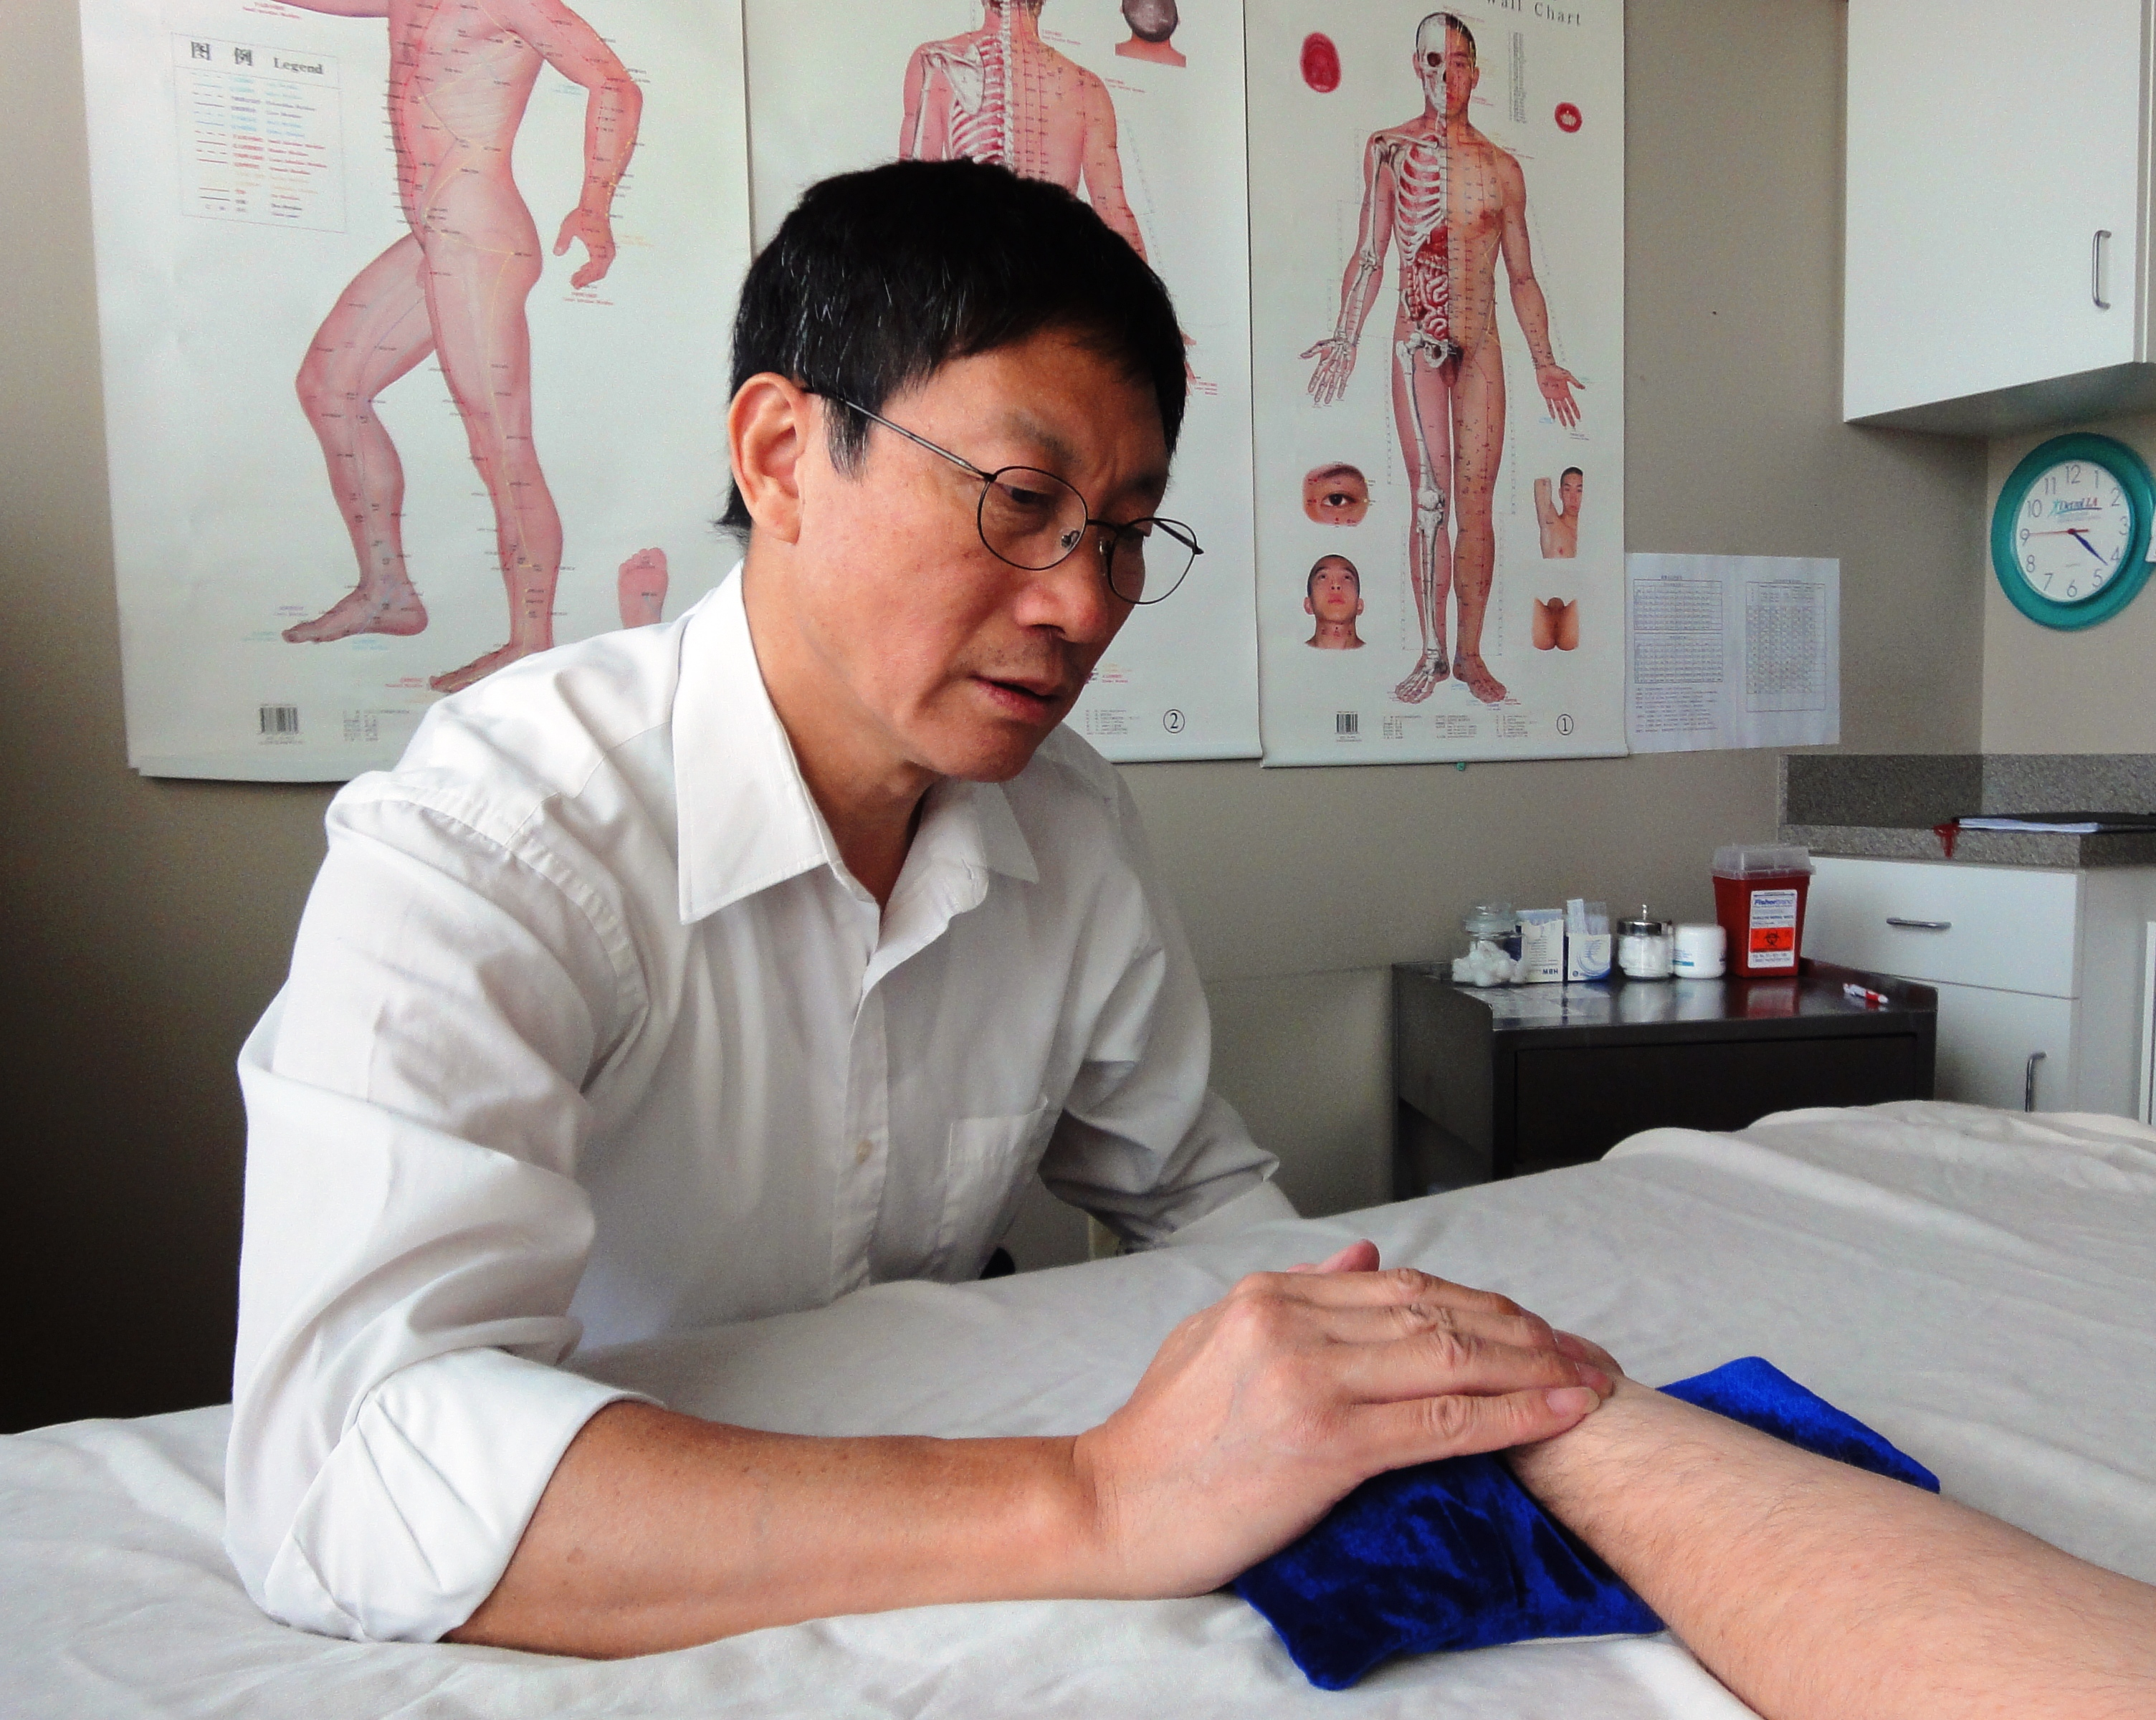 Acupuncture & Chinese Medicine image 2